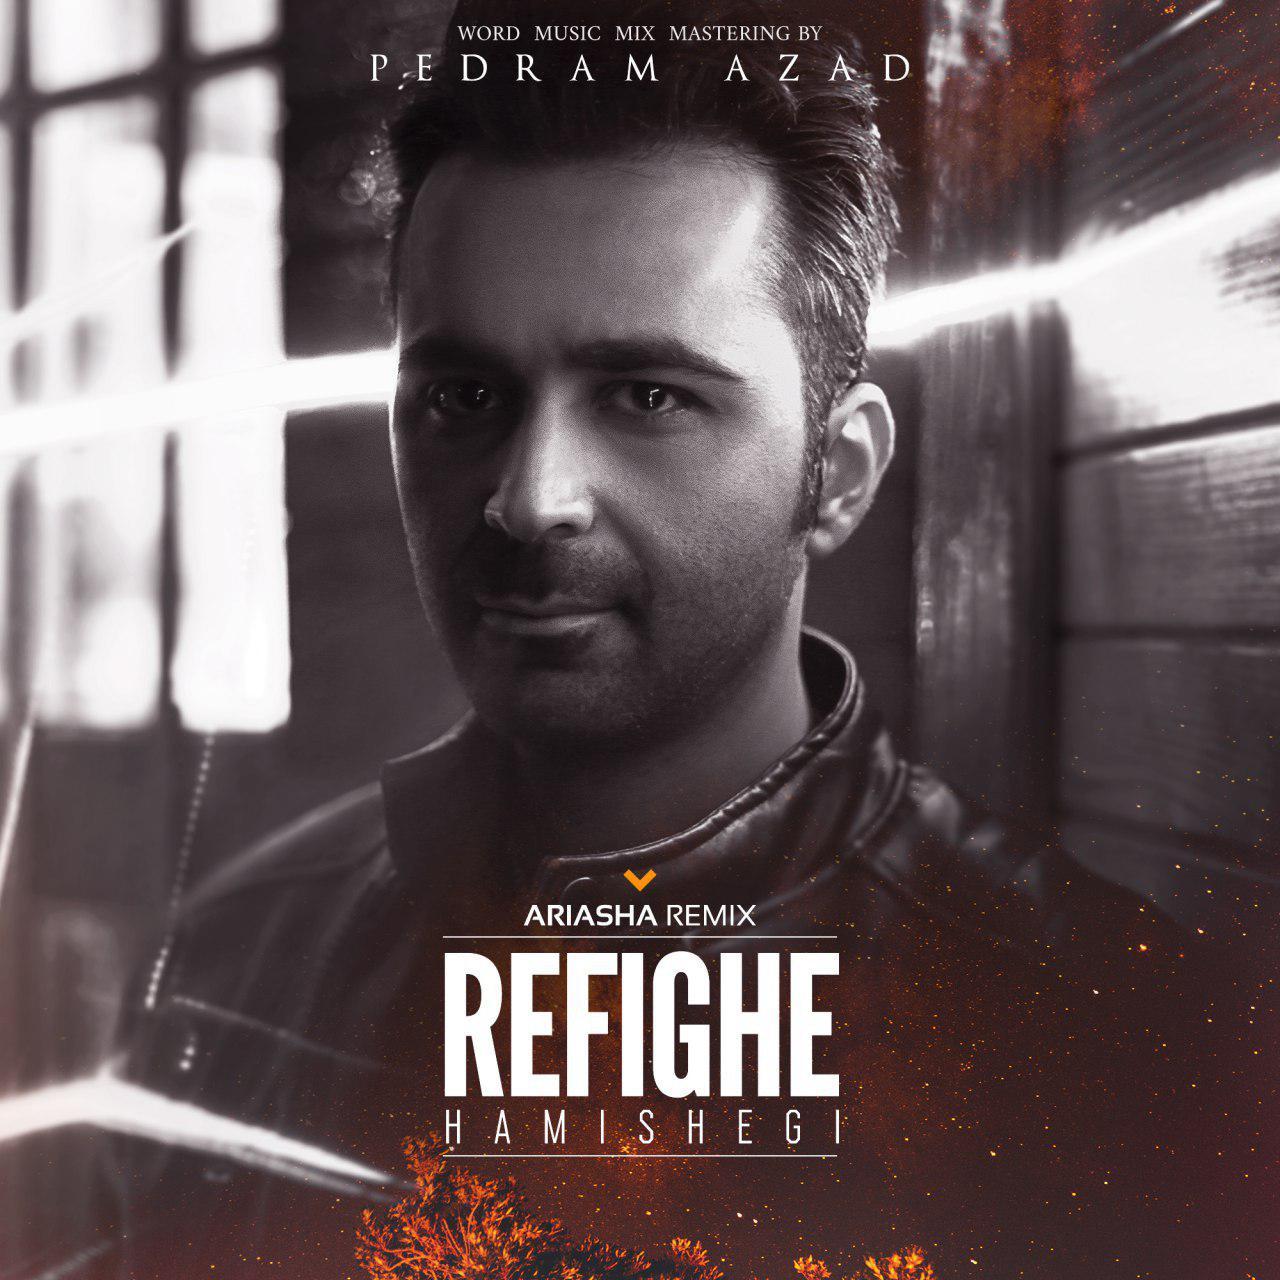 Pedram Azad – Refighe Hamishegi (Remix)